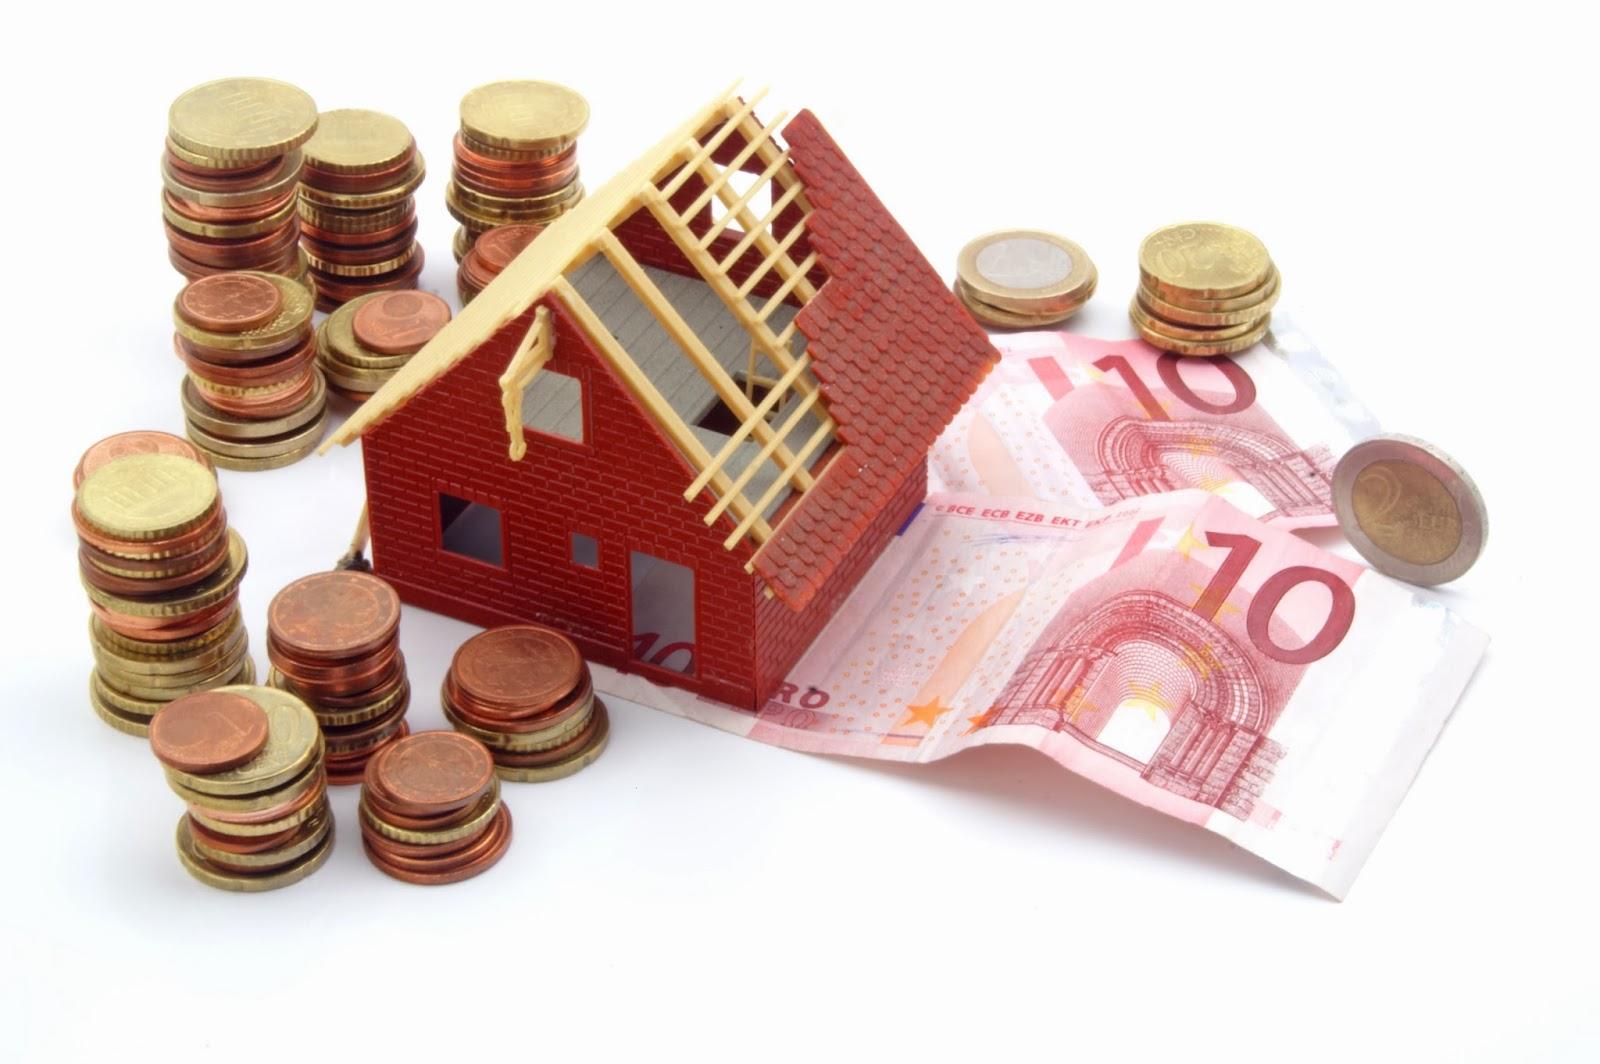 Recupero edilizio, tutti i bonus fiscali 2015